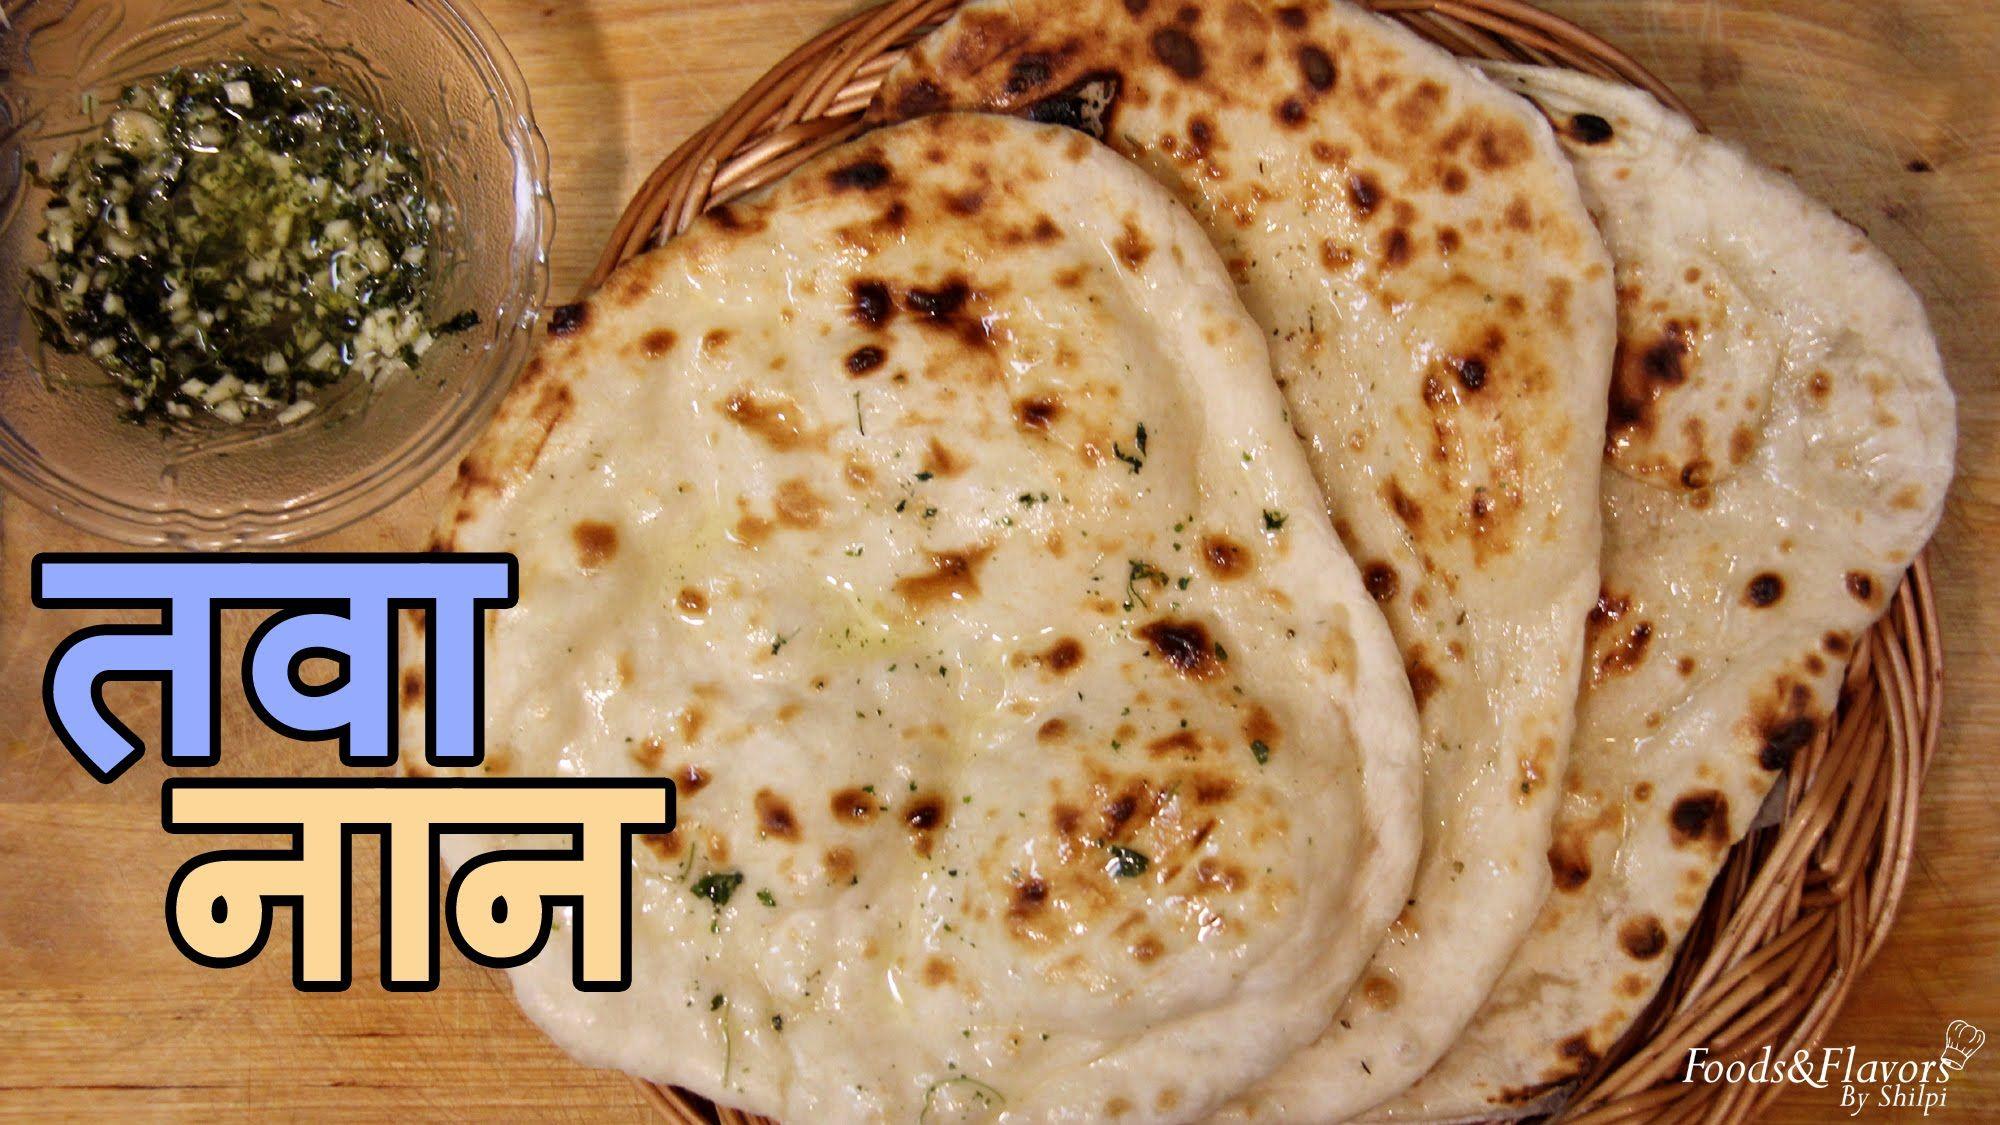 Nann recipe in hindi learn how to make garlic naan butter naan on food nann recipe in hindi forumfinder Gallery